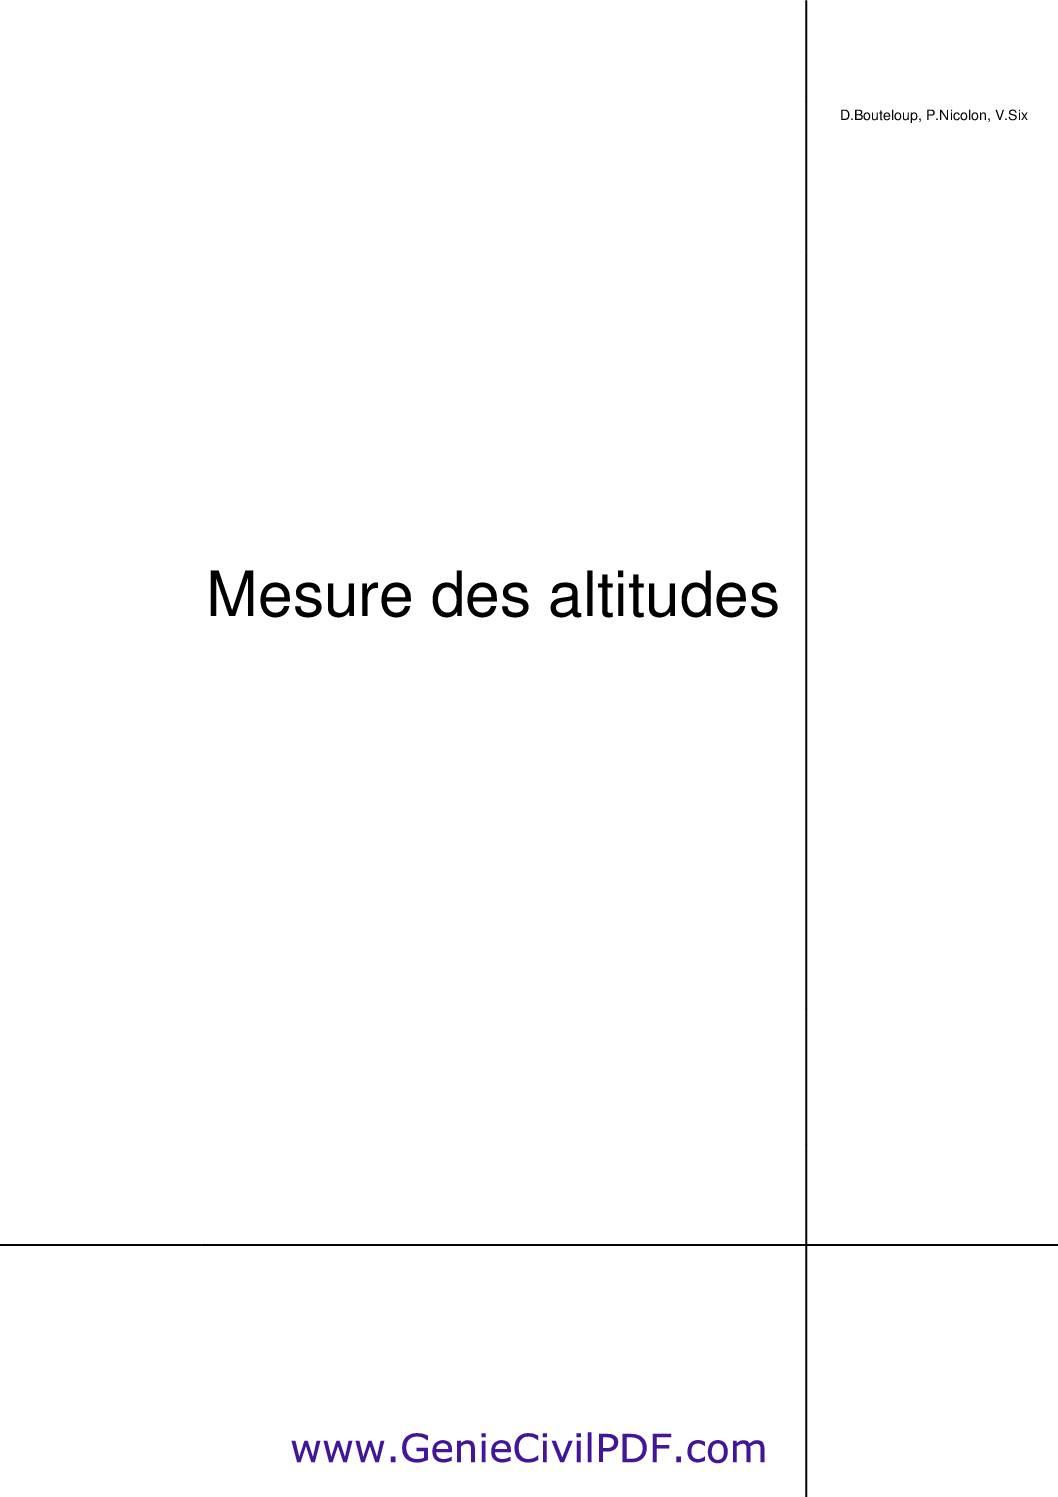 Mesure des altitudes